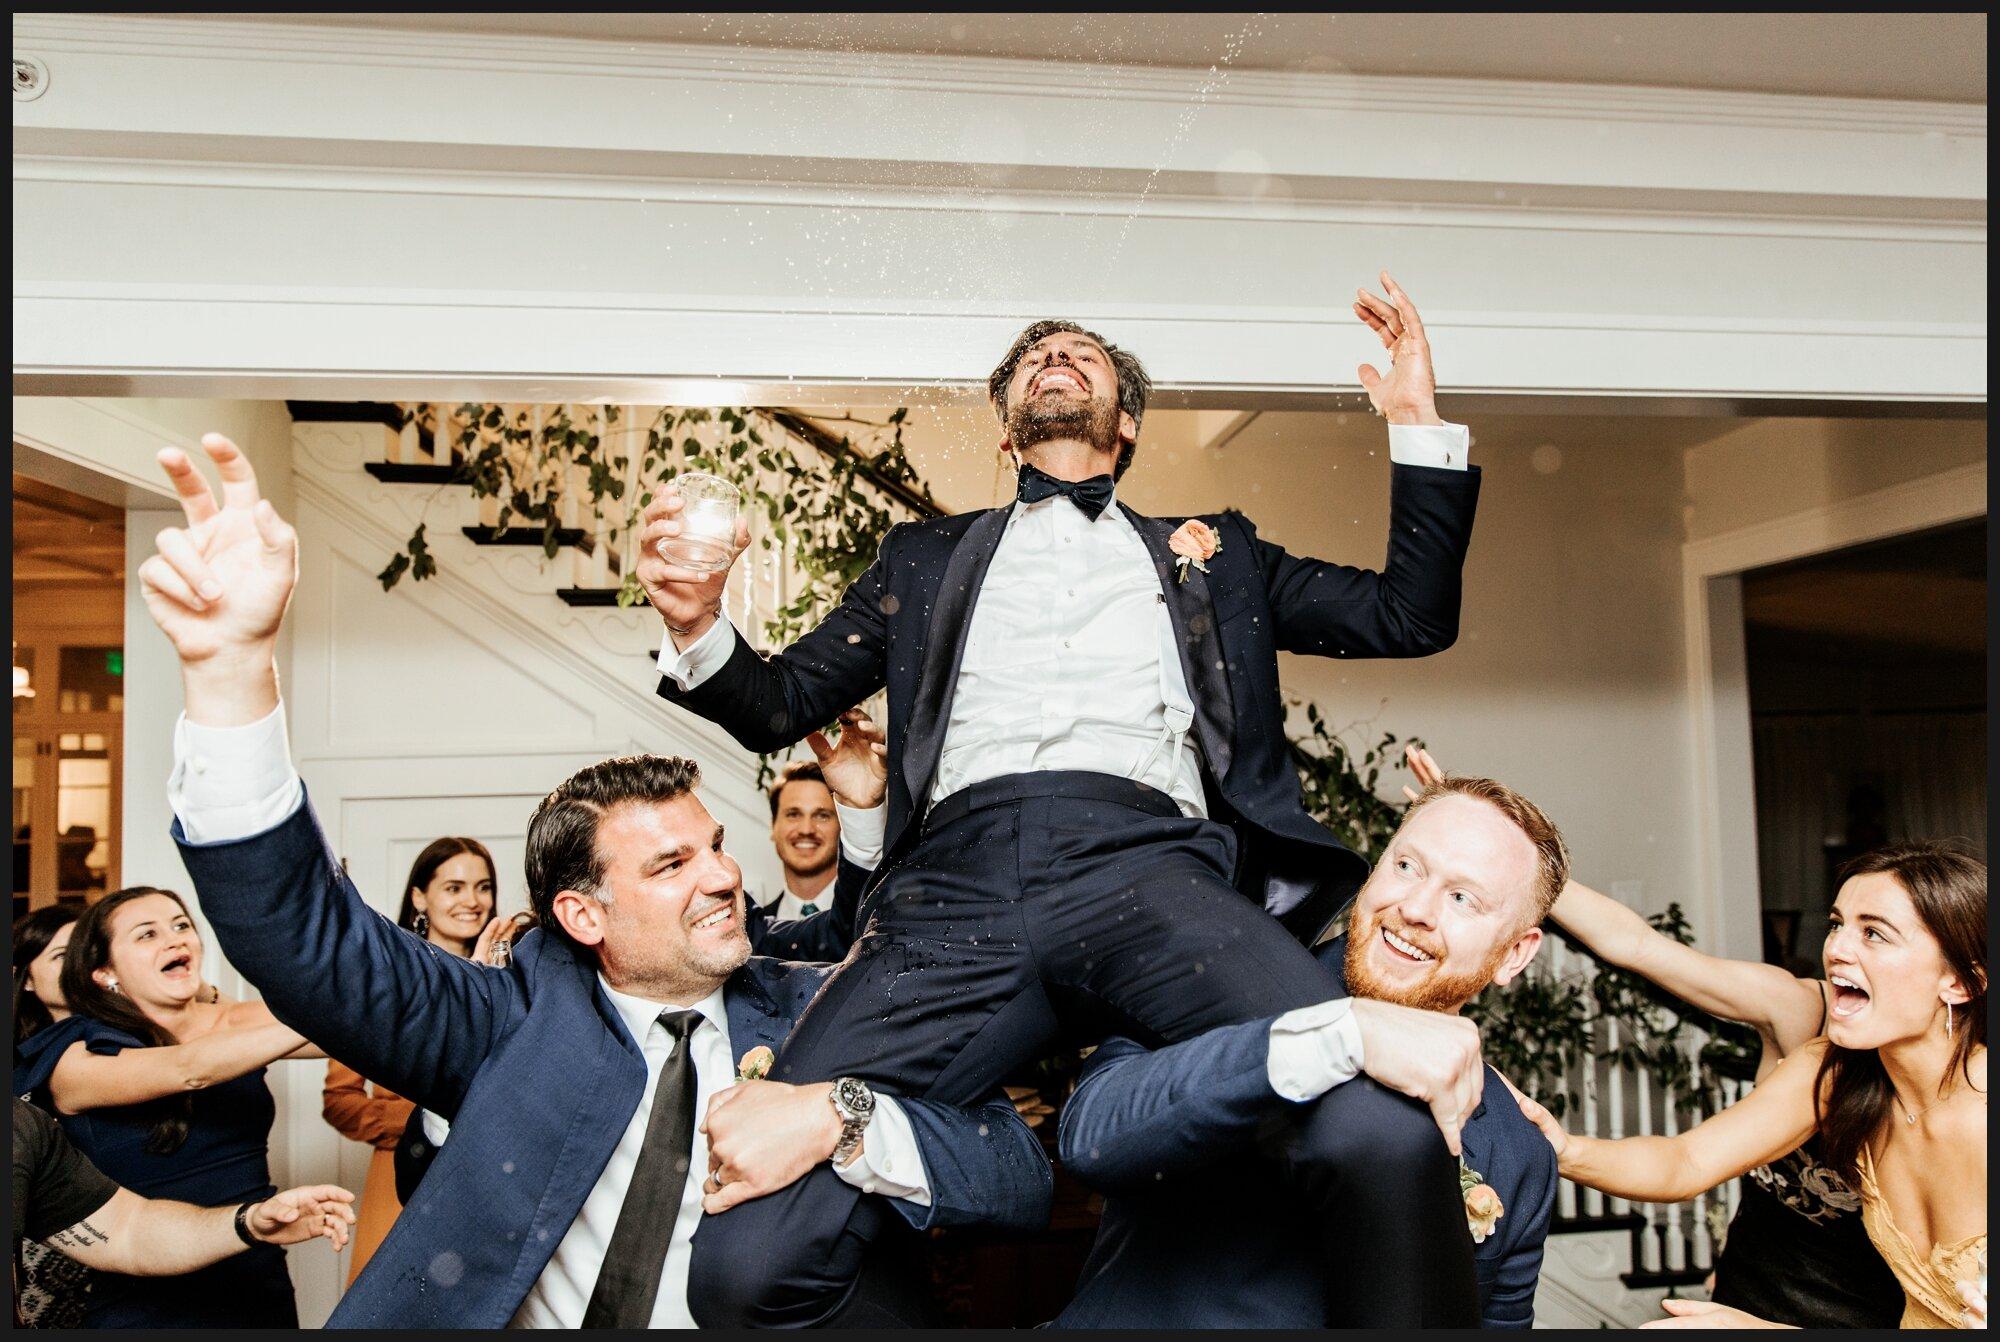 Orlando-Wedding-Photographer-destination-wedding-photographer-florida-wedding-photographer-hawaii-wedding-photographer_0770.jpg